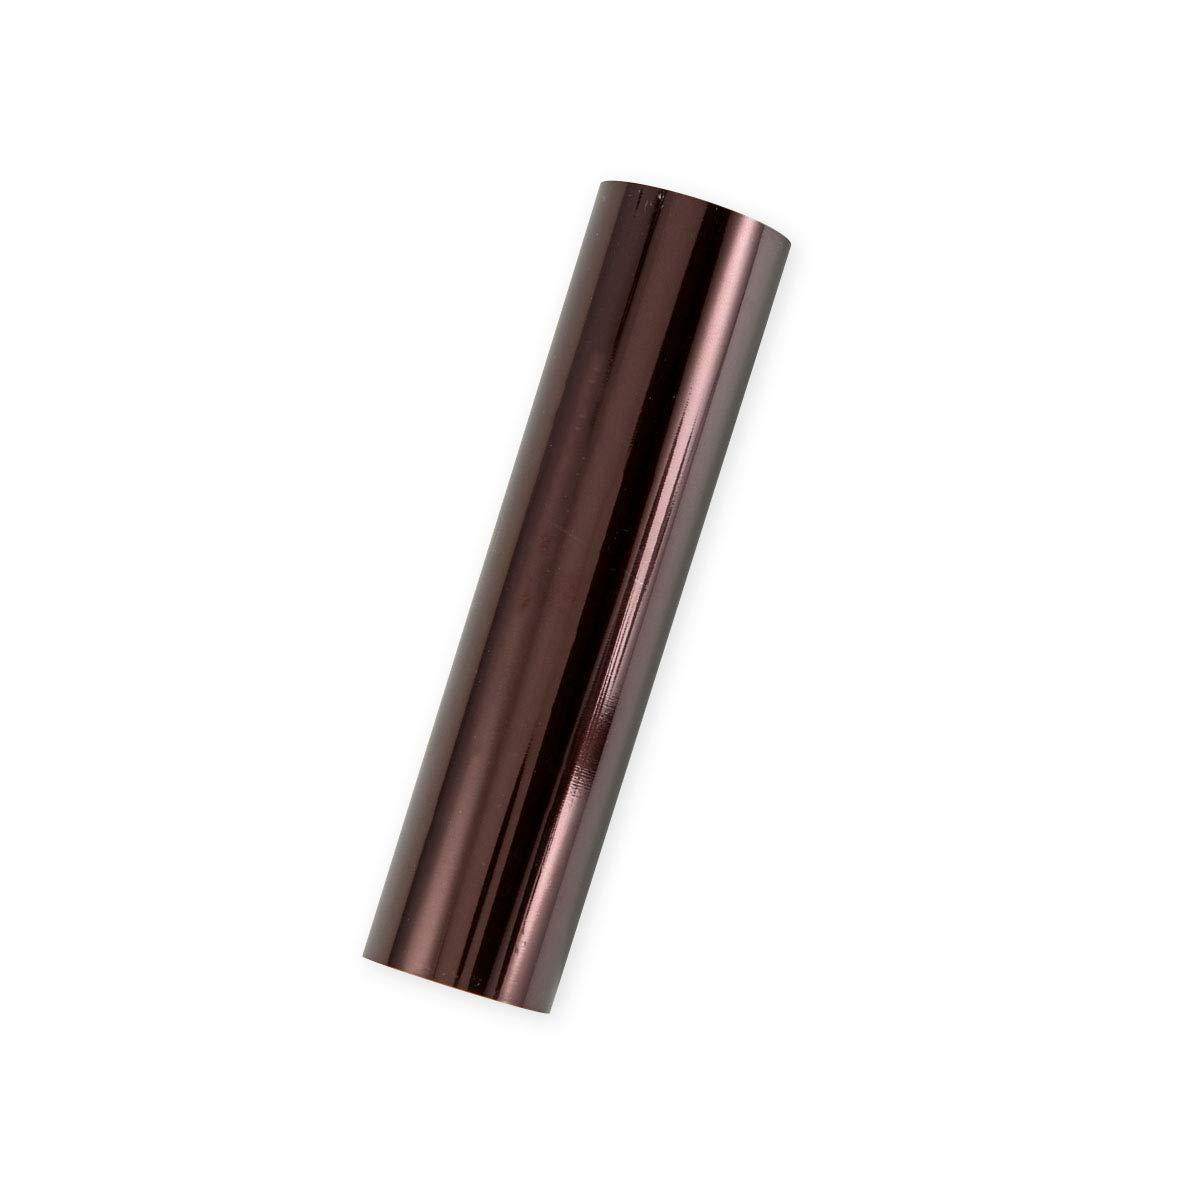 Spellbinders GLF-036 Espresso Bean Glimmer Hot Foil Roll